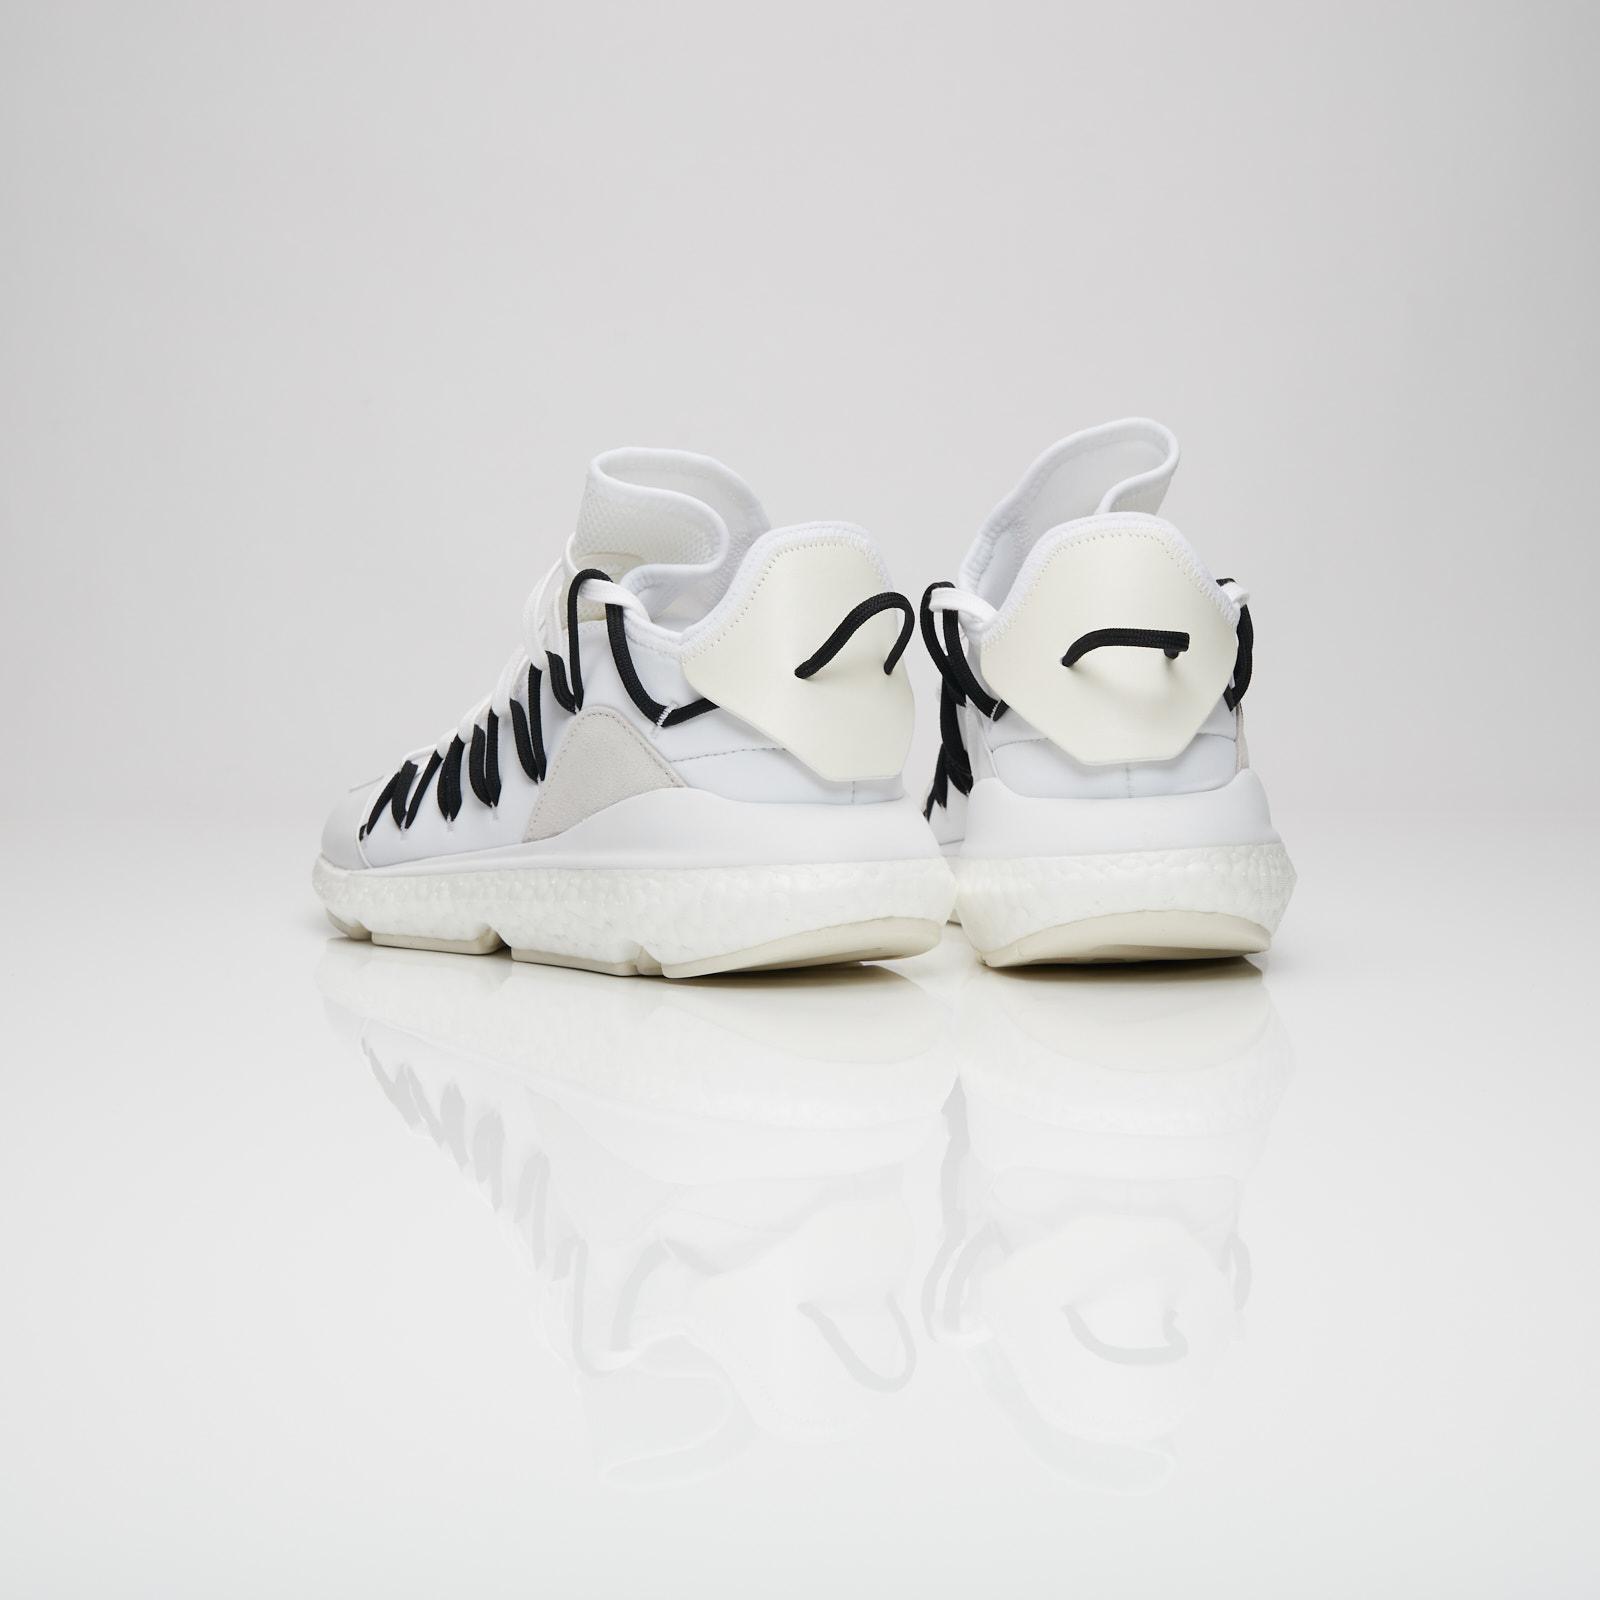 adidas Y 3 Kusari Bc0956 Basketsnstuff Baskets streetwear